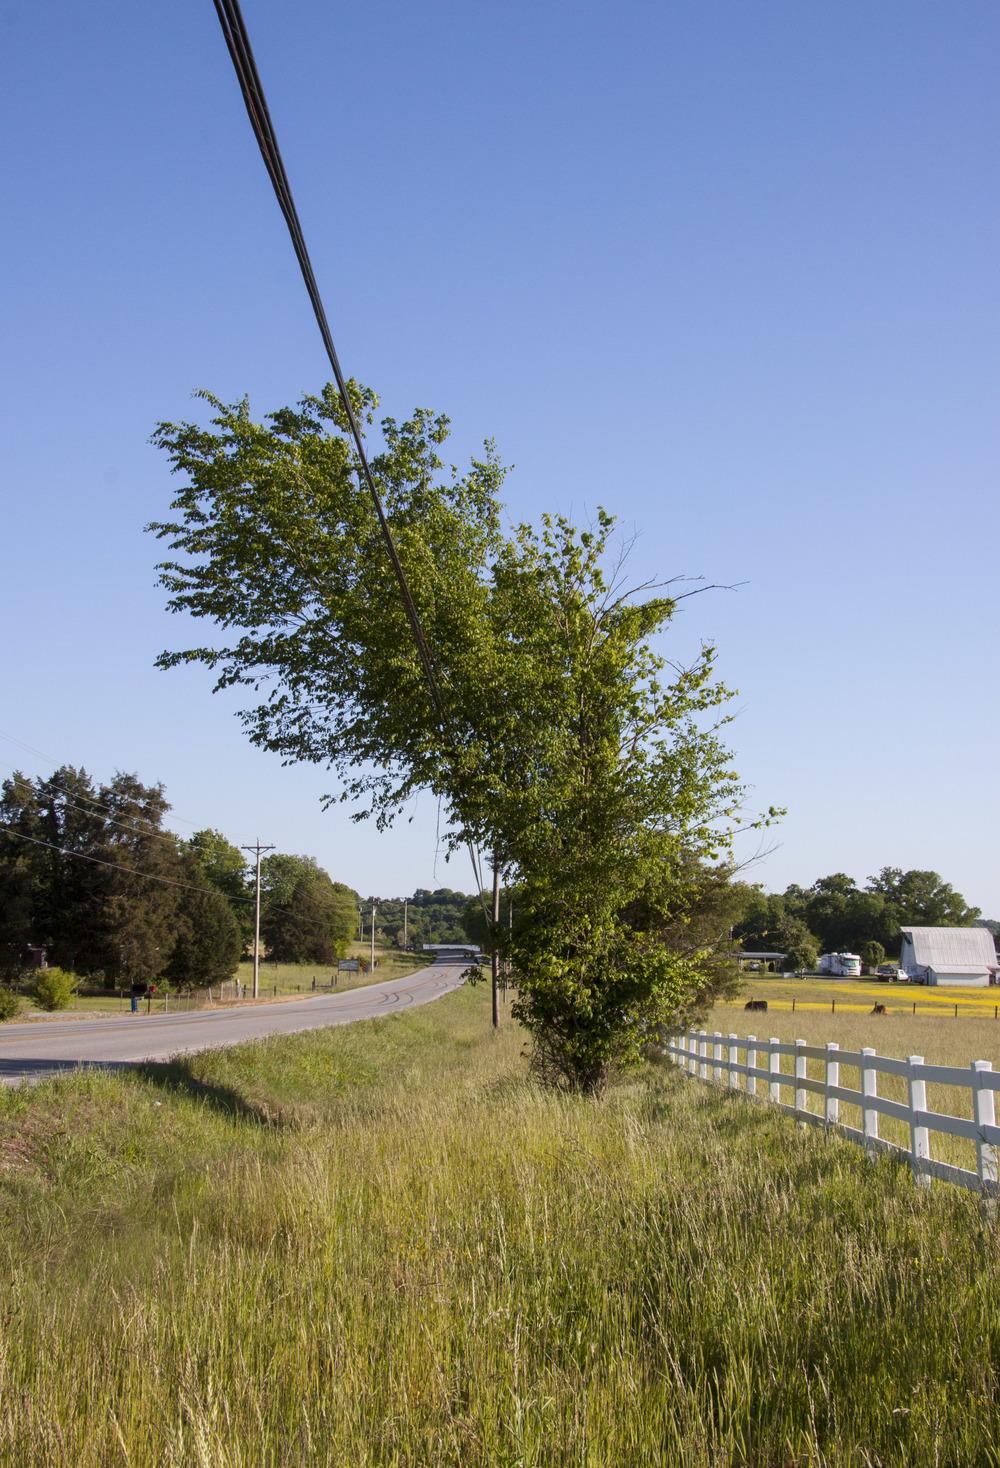 130513_Tennessee_073_A.JPG